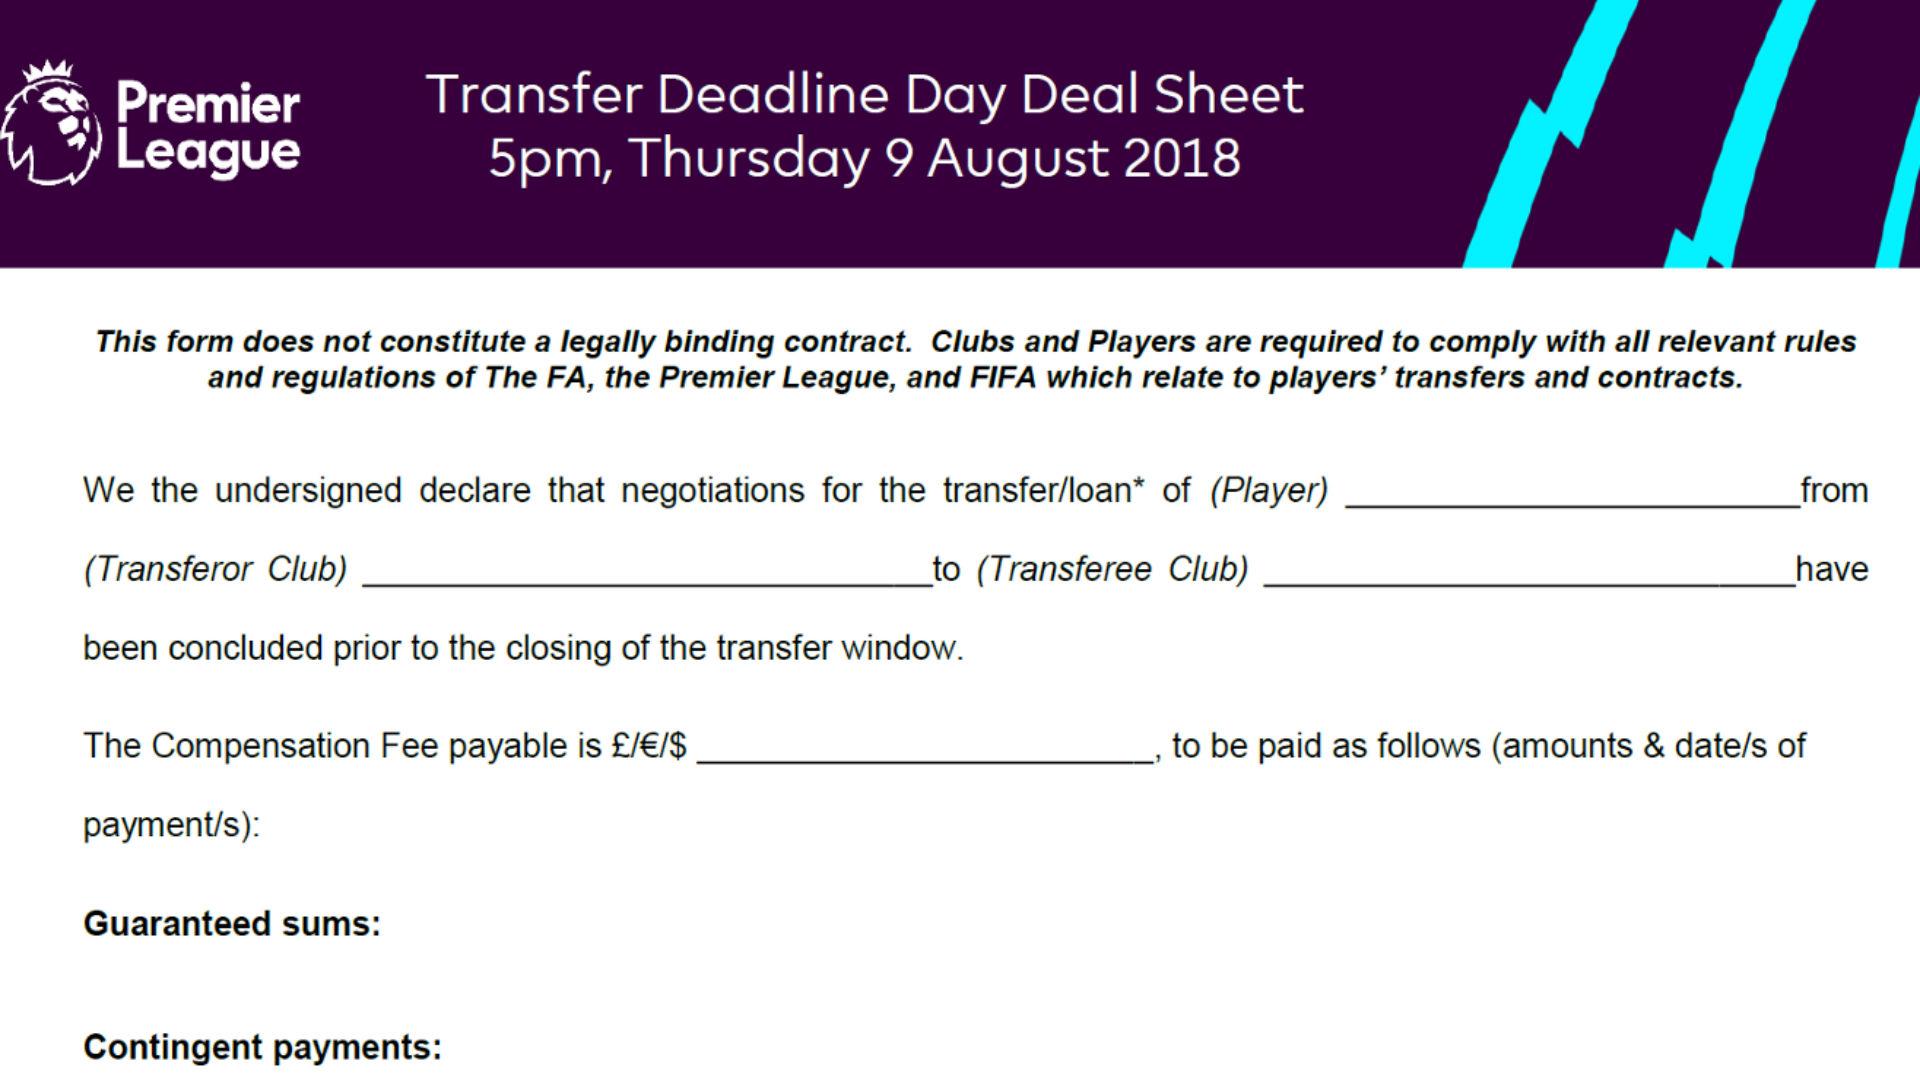 Premier League transfer deal sheet